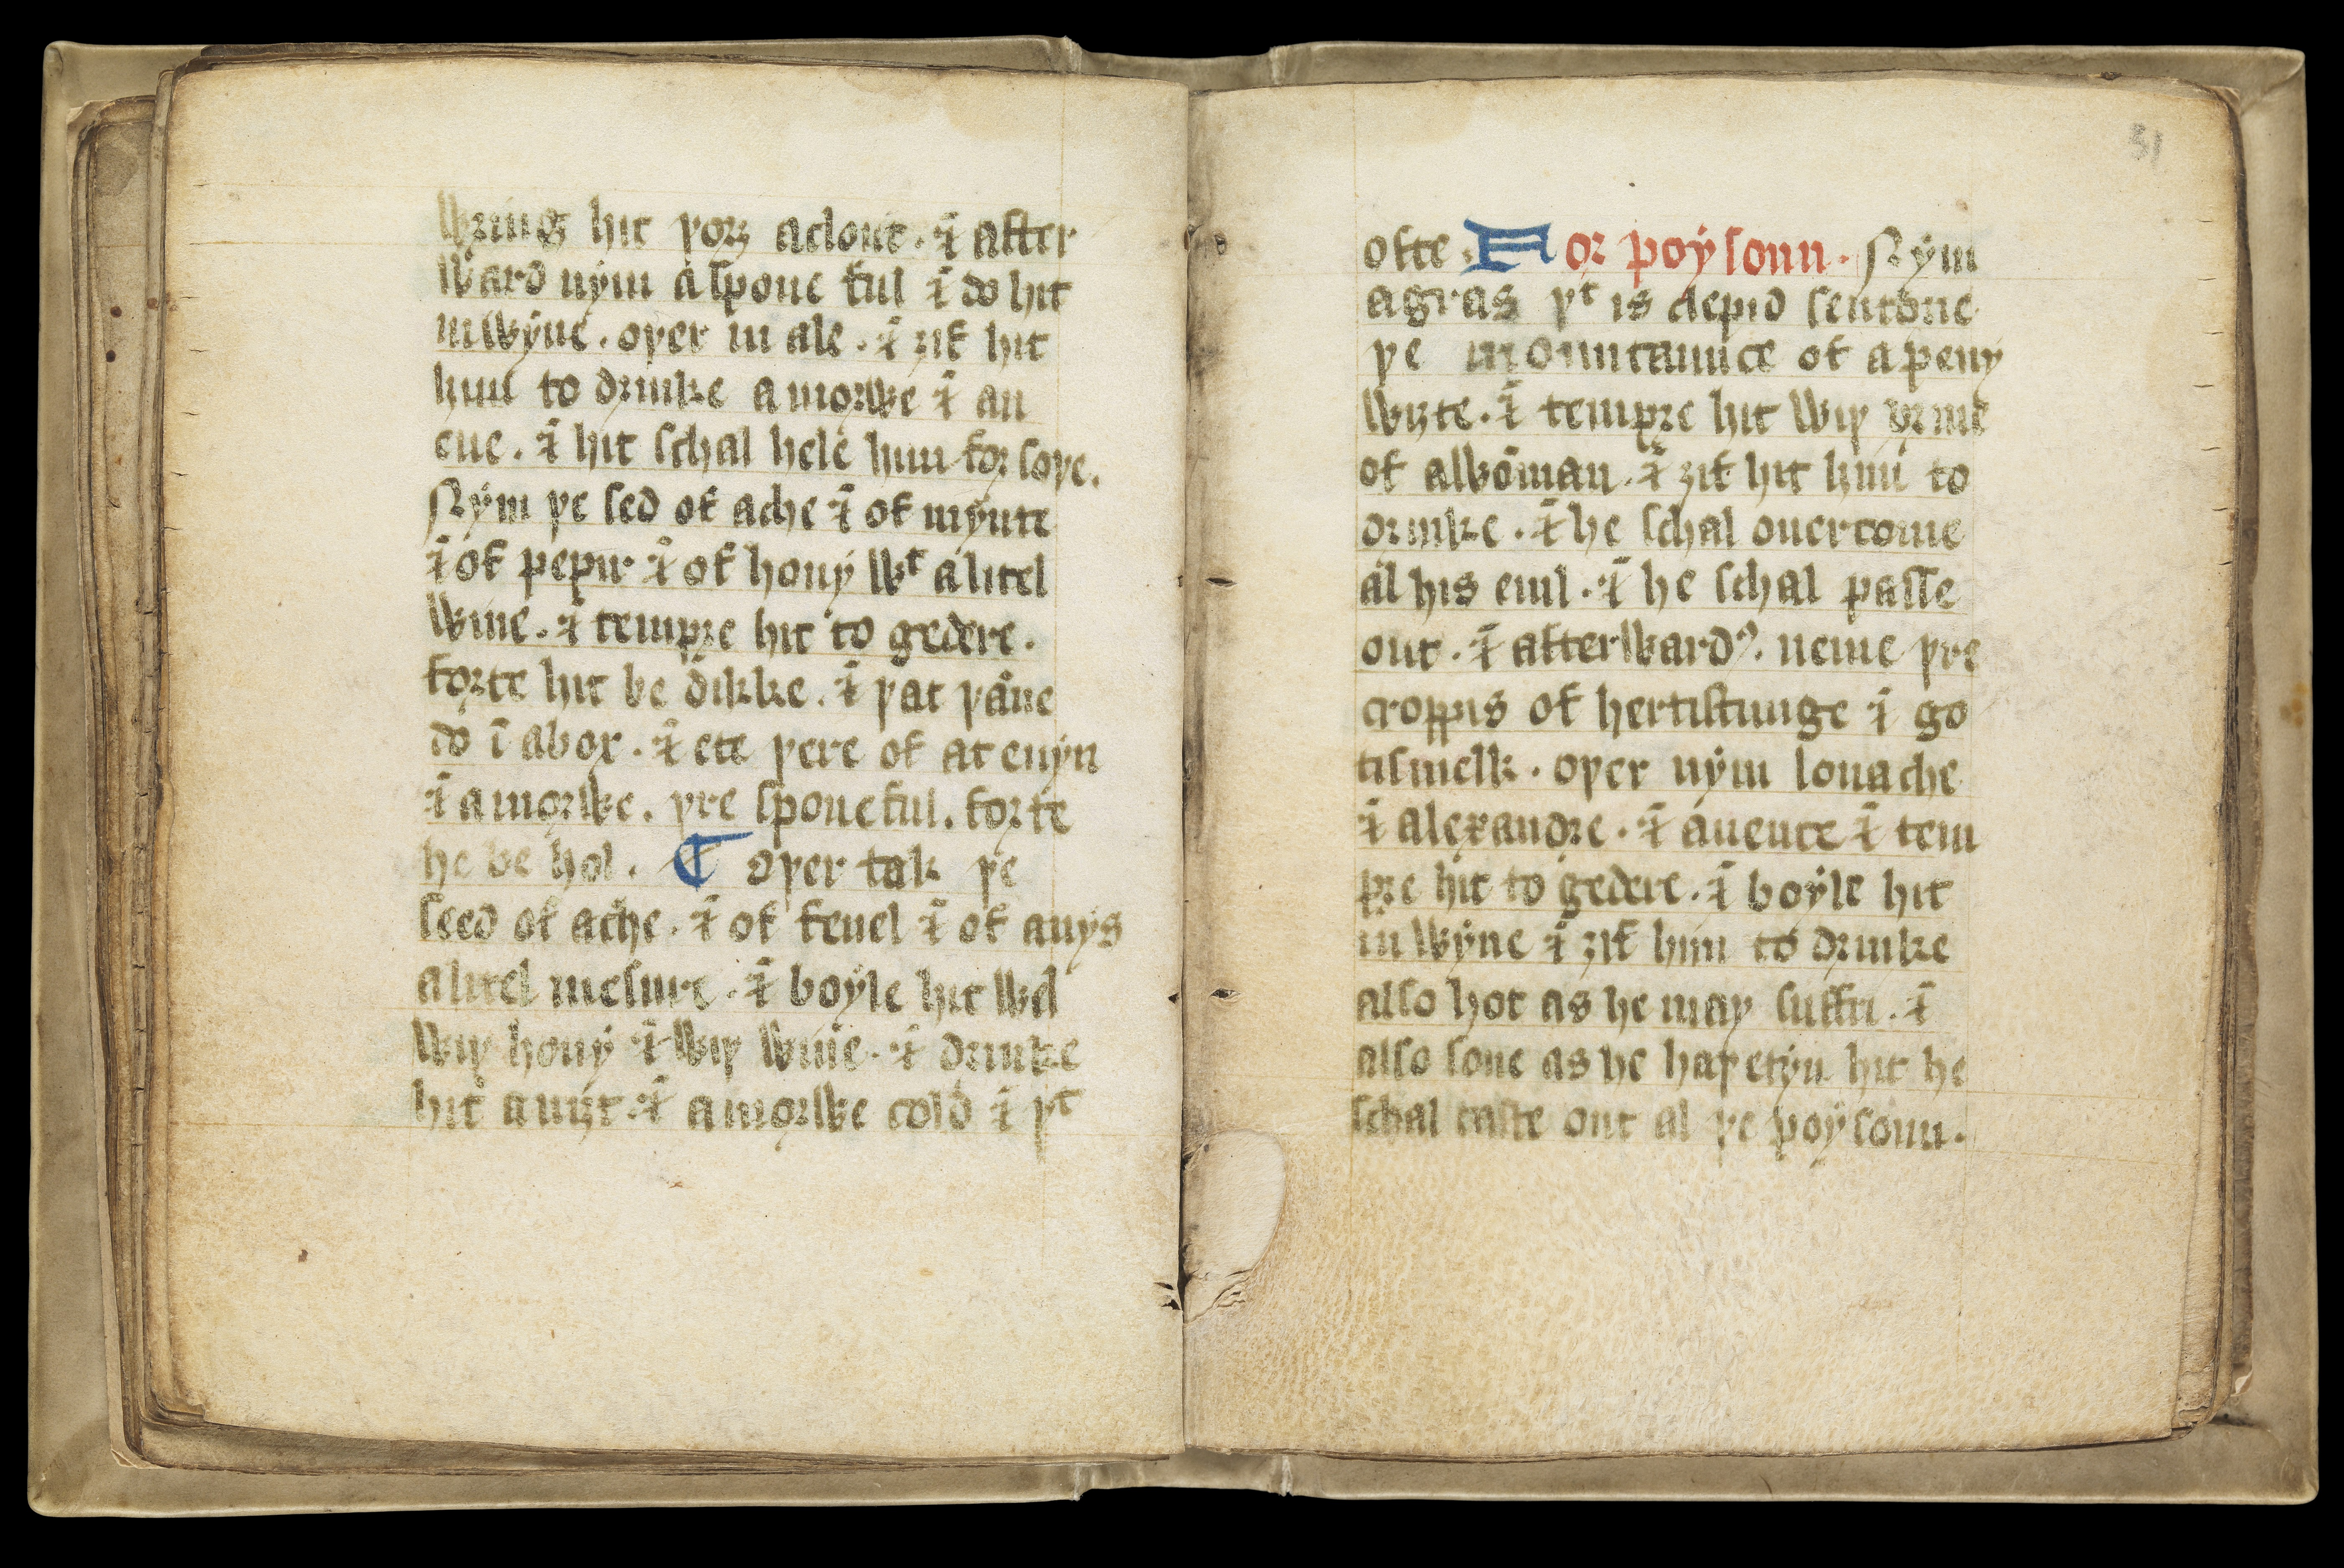 File:Leech-Books, II  Wellcome L0072484 jpg - Wikimedia Commons